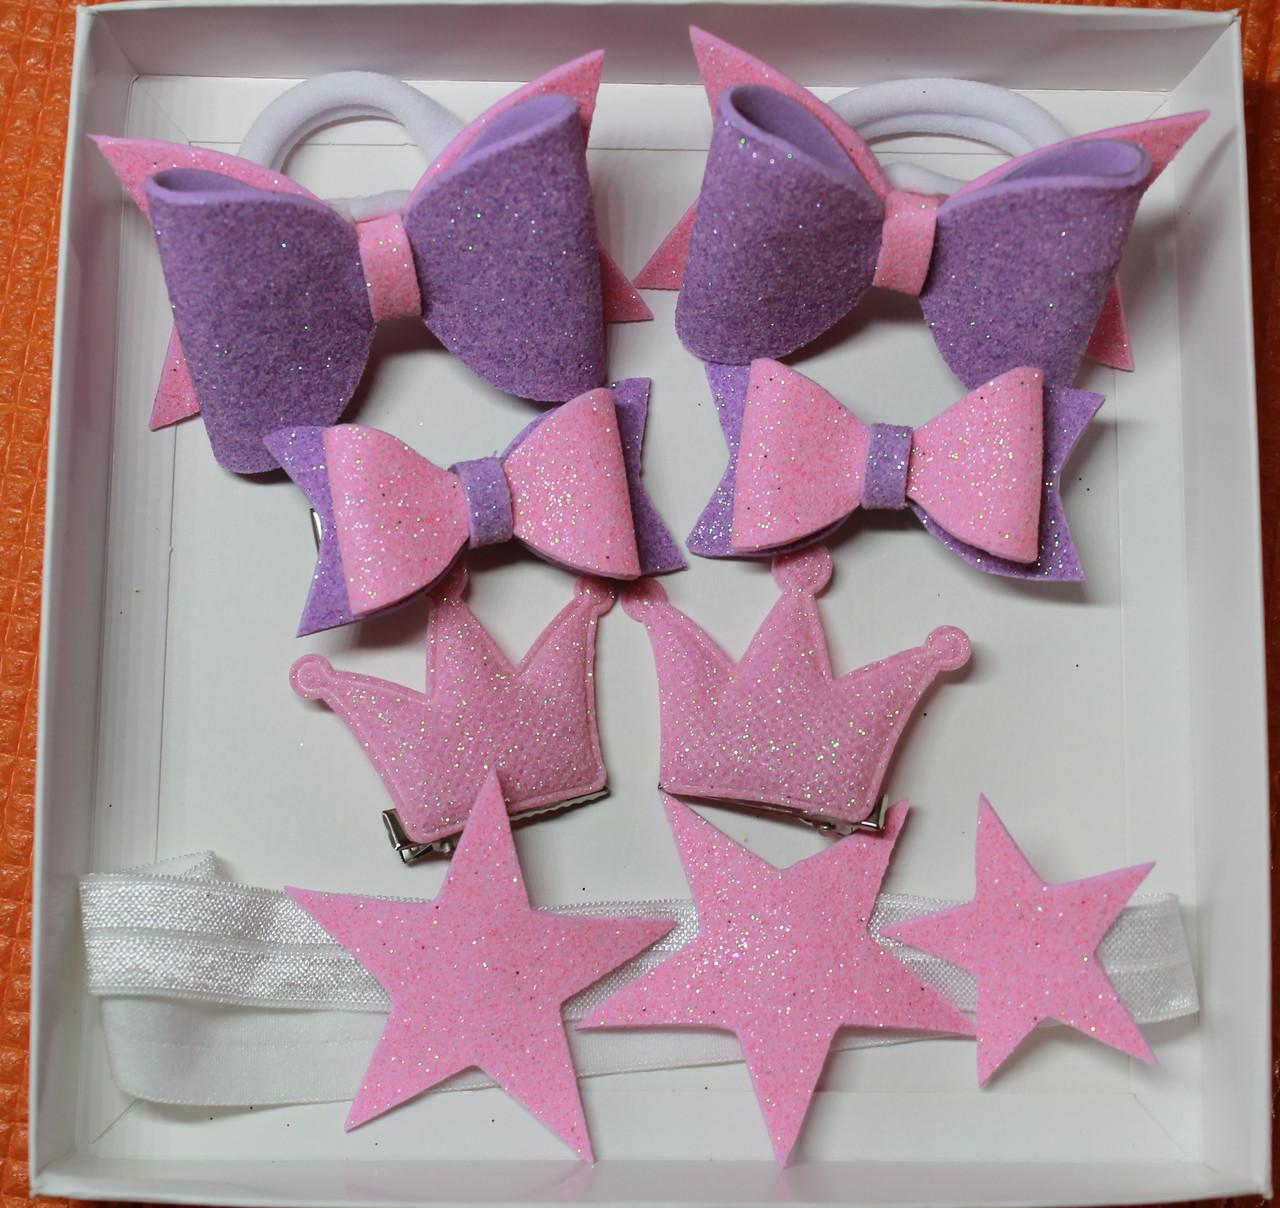 d2c38e99f690 Набор детских аксессуаров для волос принцесса (повязка+заколки+резинки)